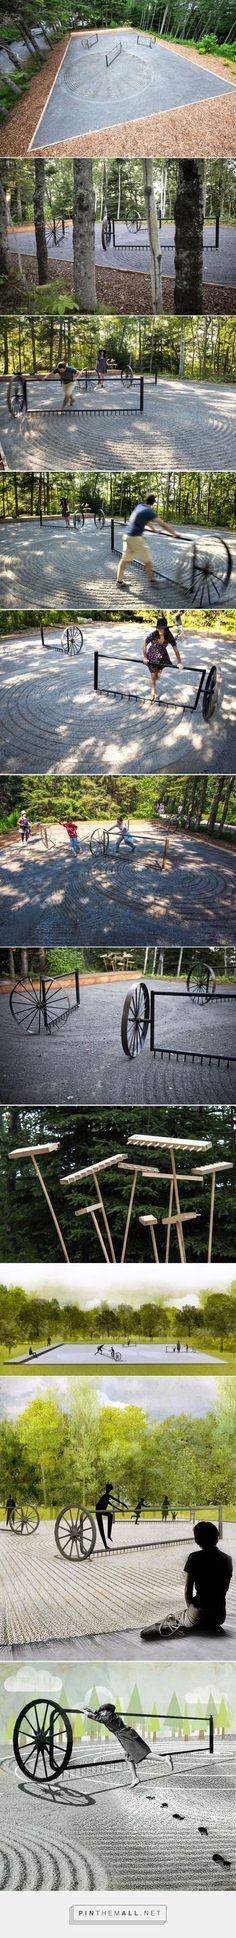 talmon biran architecture composes interactive zen garden - created via http://pinthemall.net: